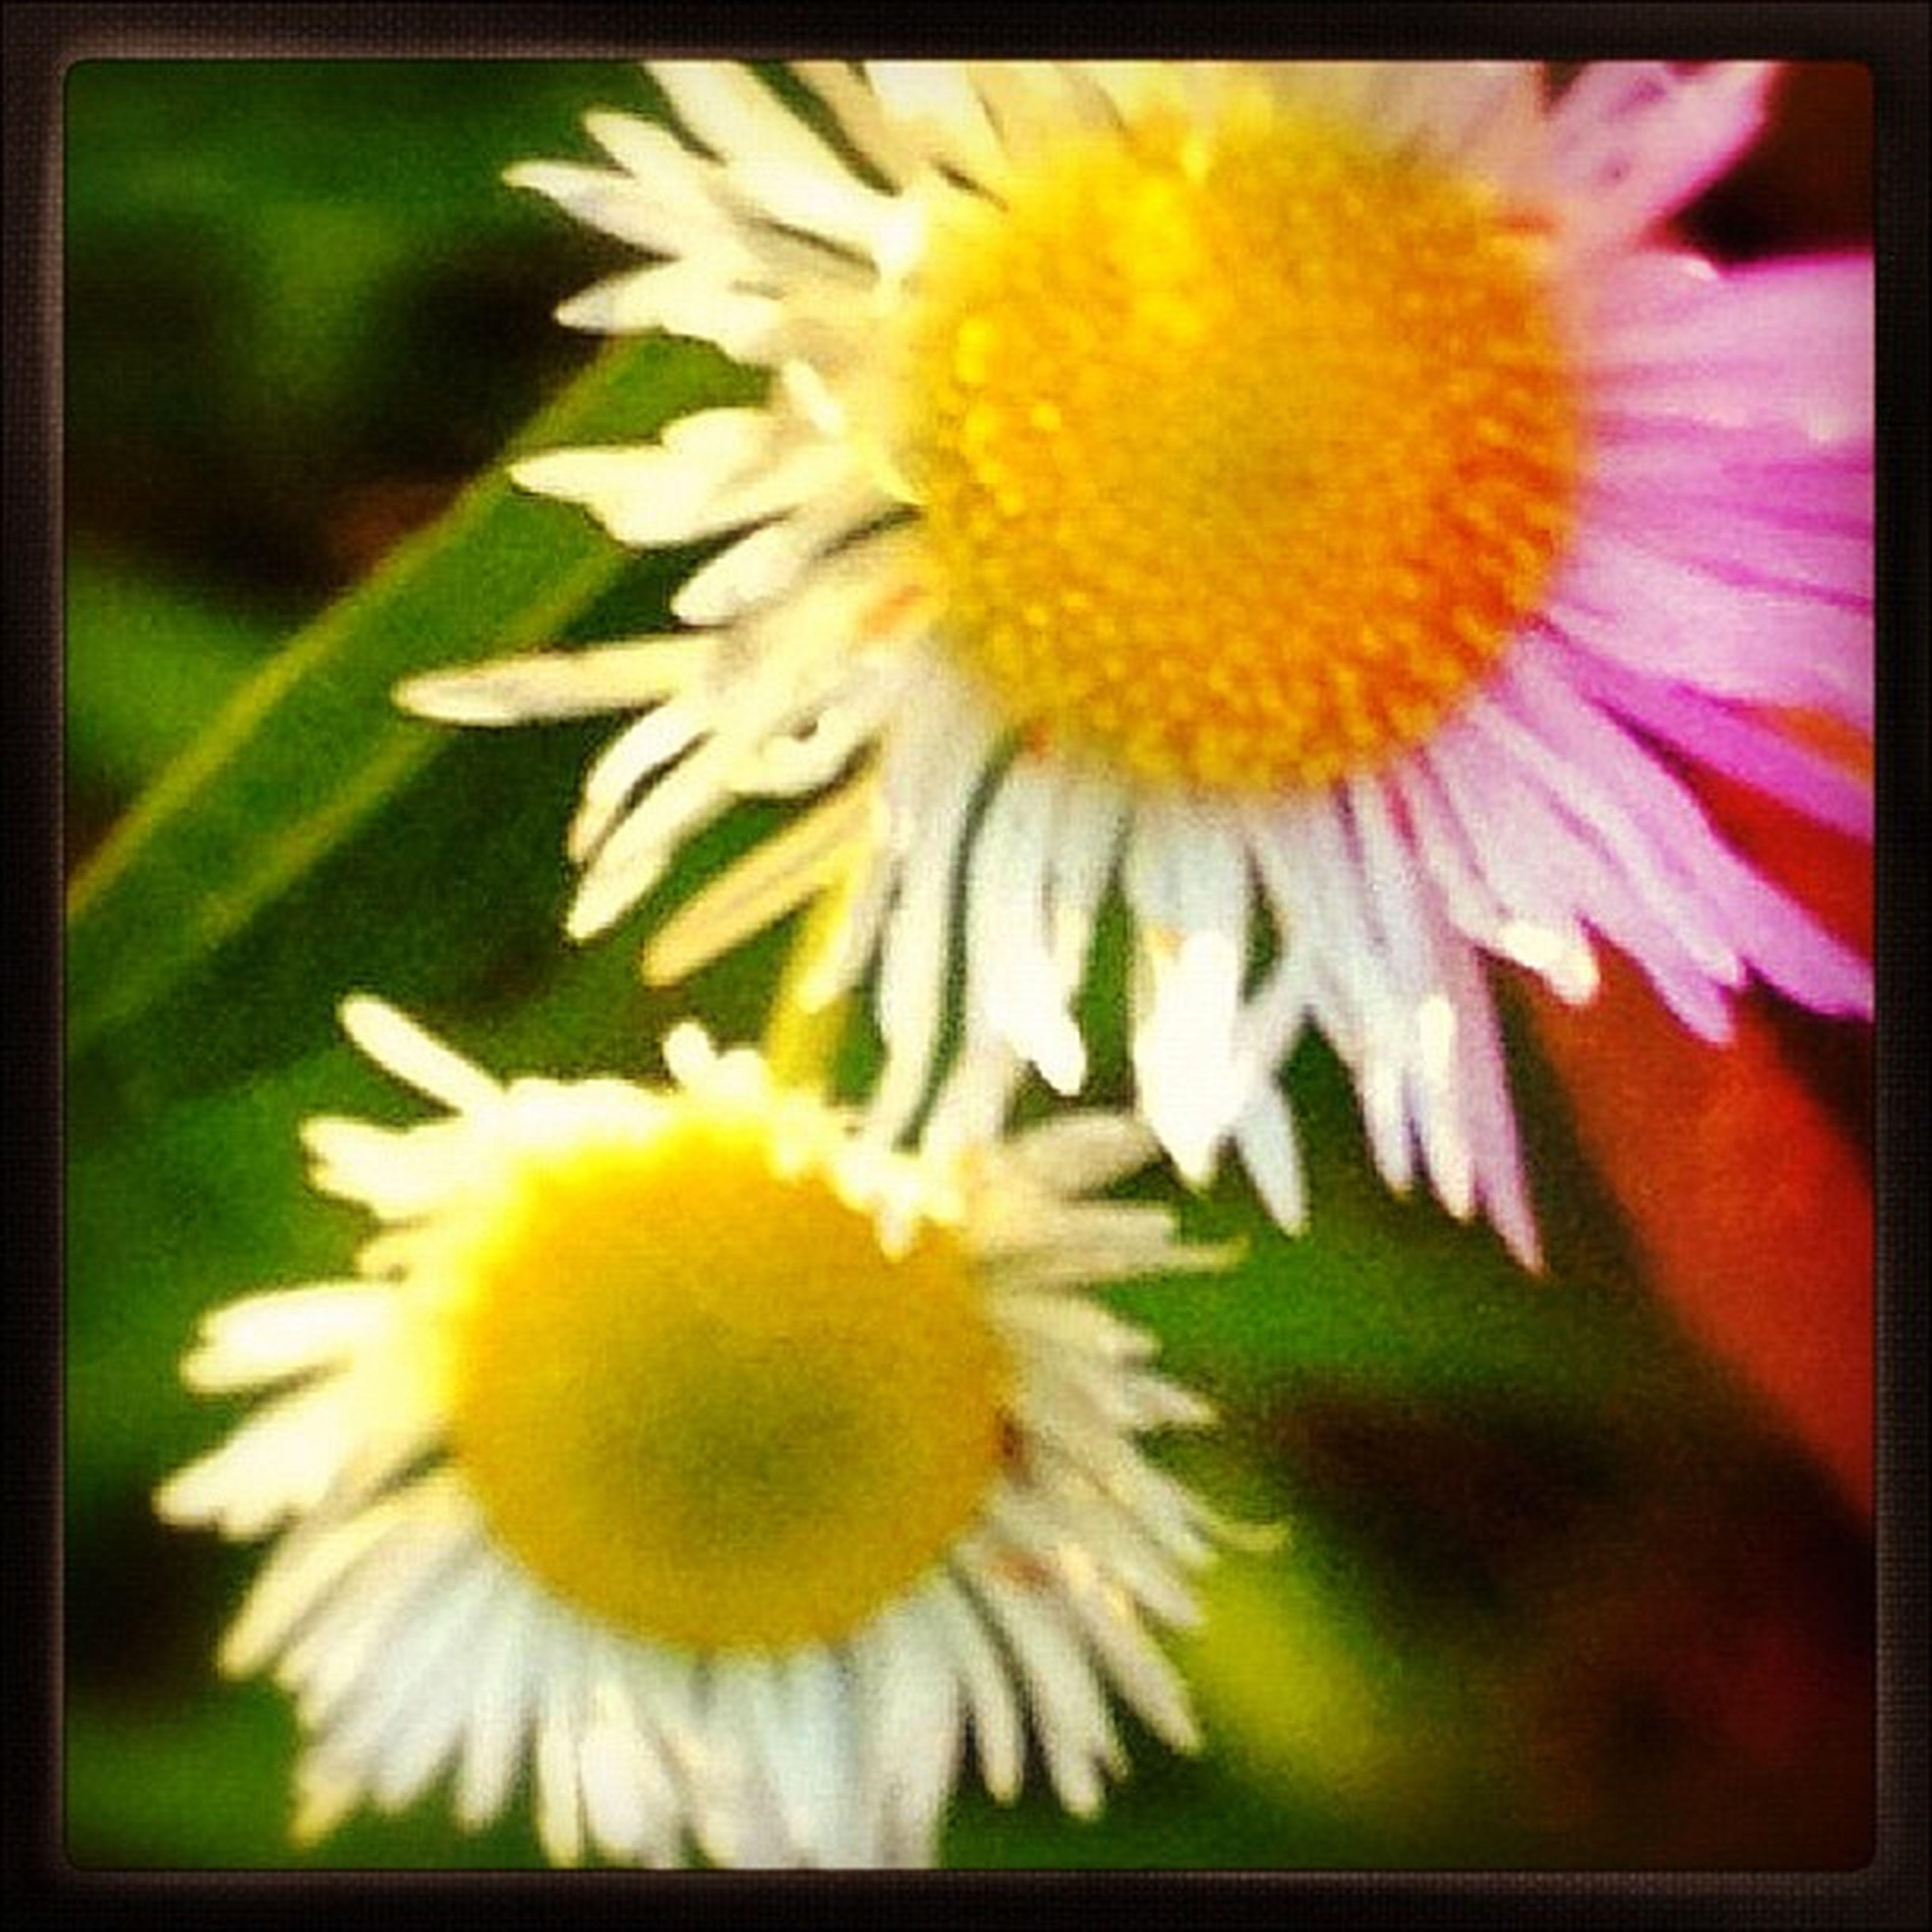 #flowers #gentle #serenity #macroflowers #macro #macroporn #flowerporn #garden #iphone4s Garden Macro IPhone4s Serenity Flowerporn Gentle Macroporn 19likes Macroflowers Flowers